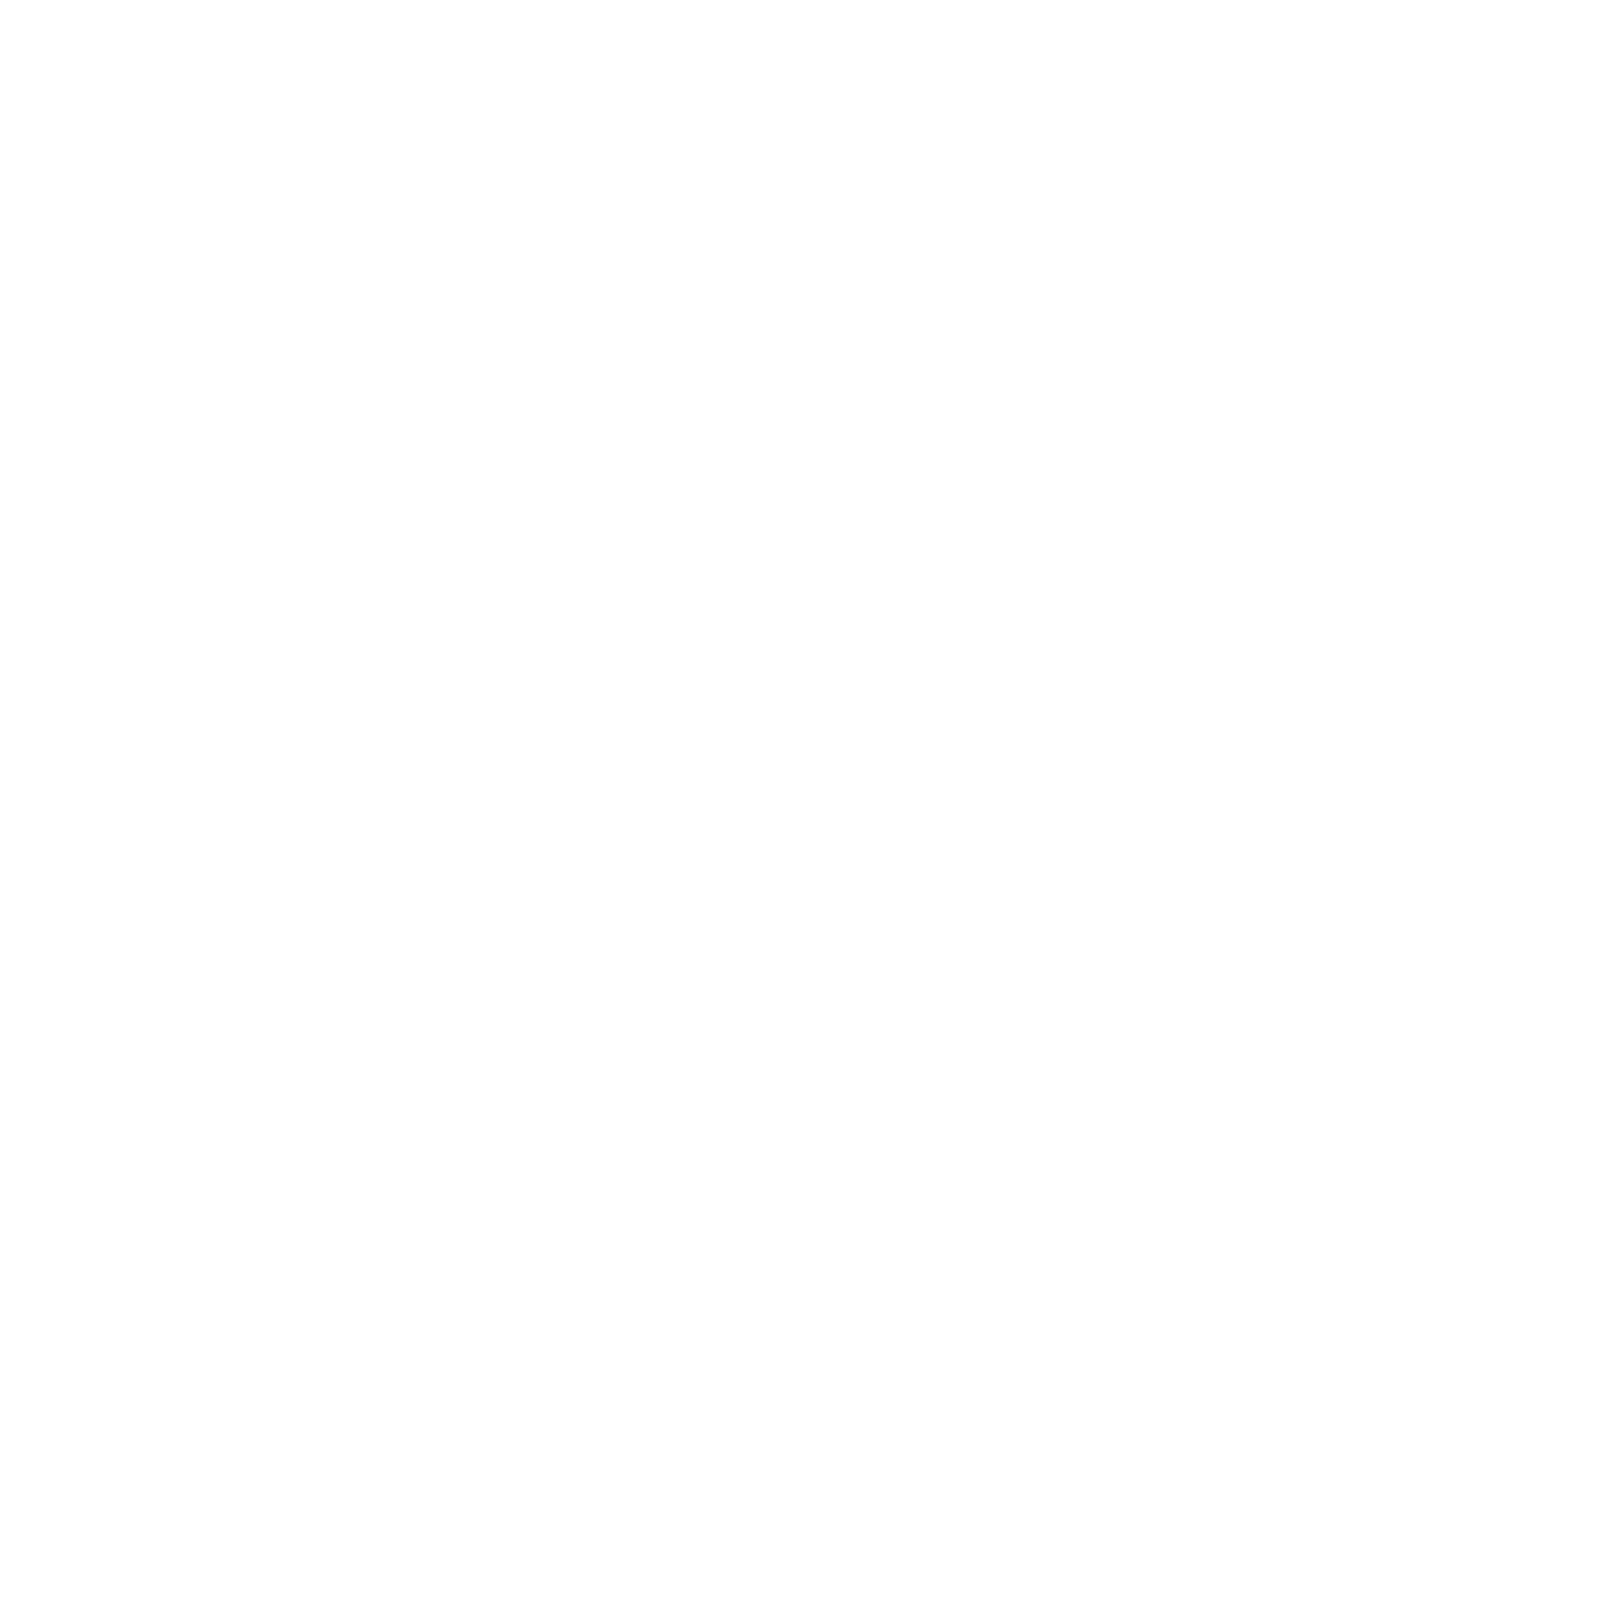 vodafone-project-logo